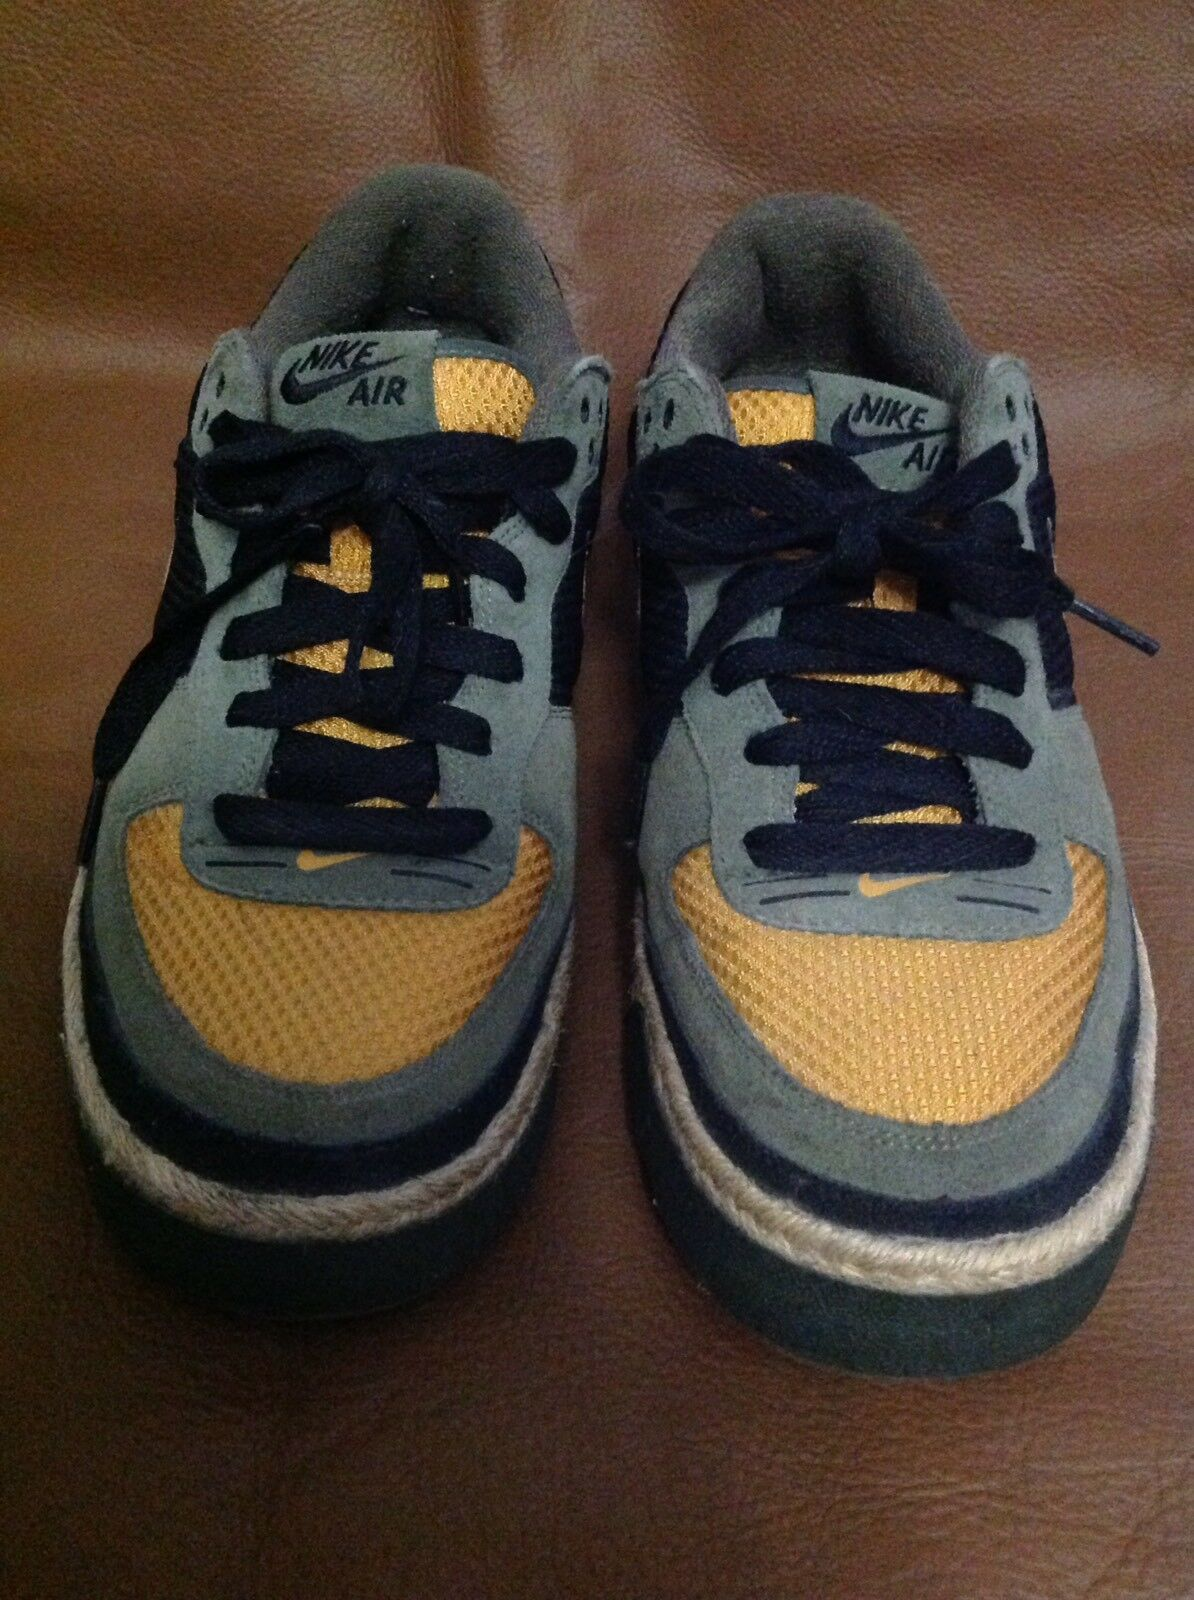 Nike Air Captivate Men's 314336-371 Army Olive Chutney Espadrille 314336-371 Men's - Size 12 137ce8